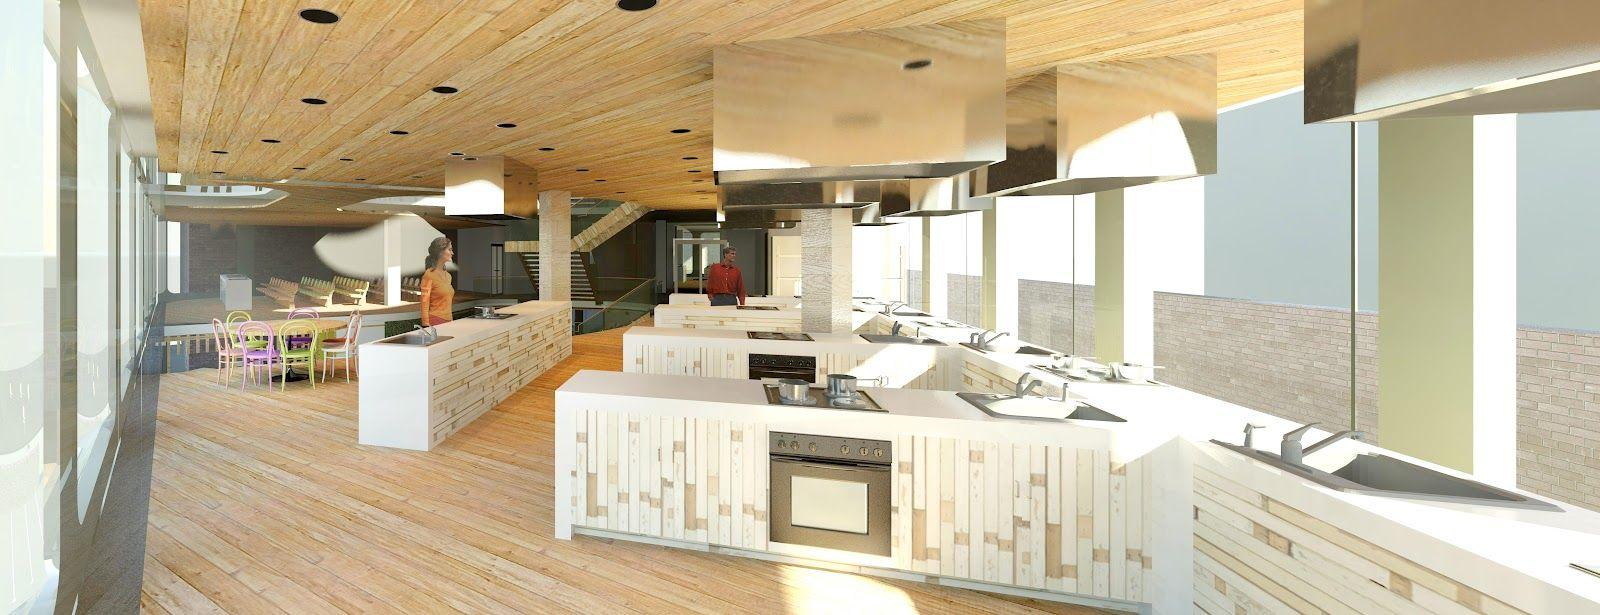 Enjoyable Caroline Maguire Designs Culinary School 3D Render My Interior Design Ideas Clesiryabchikinfo